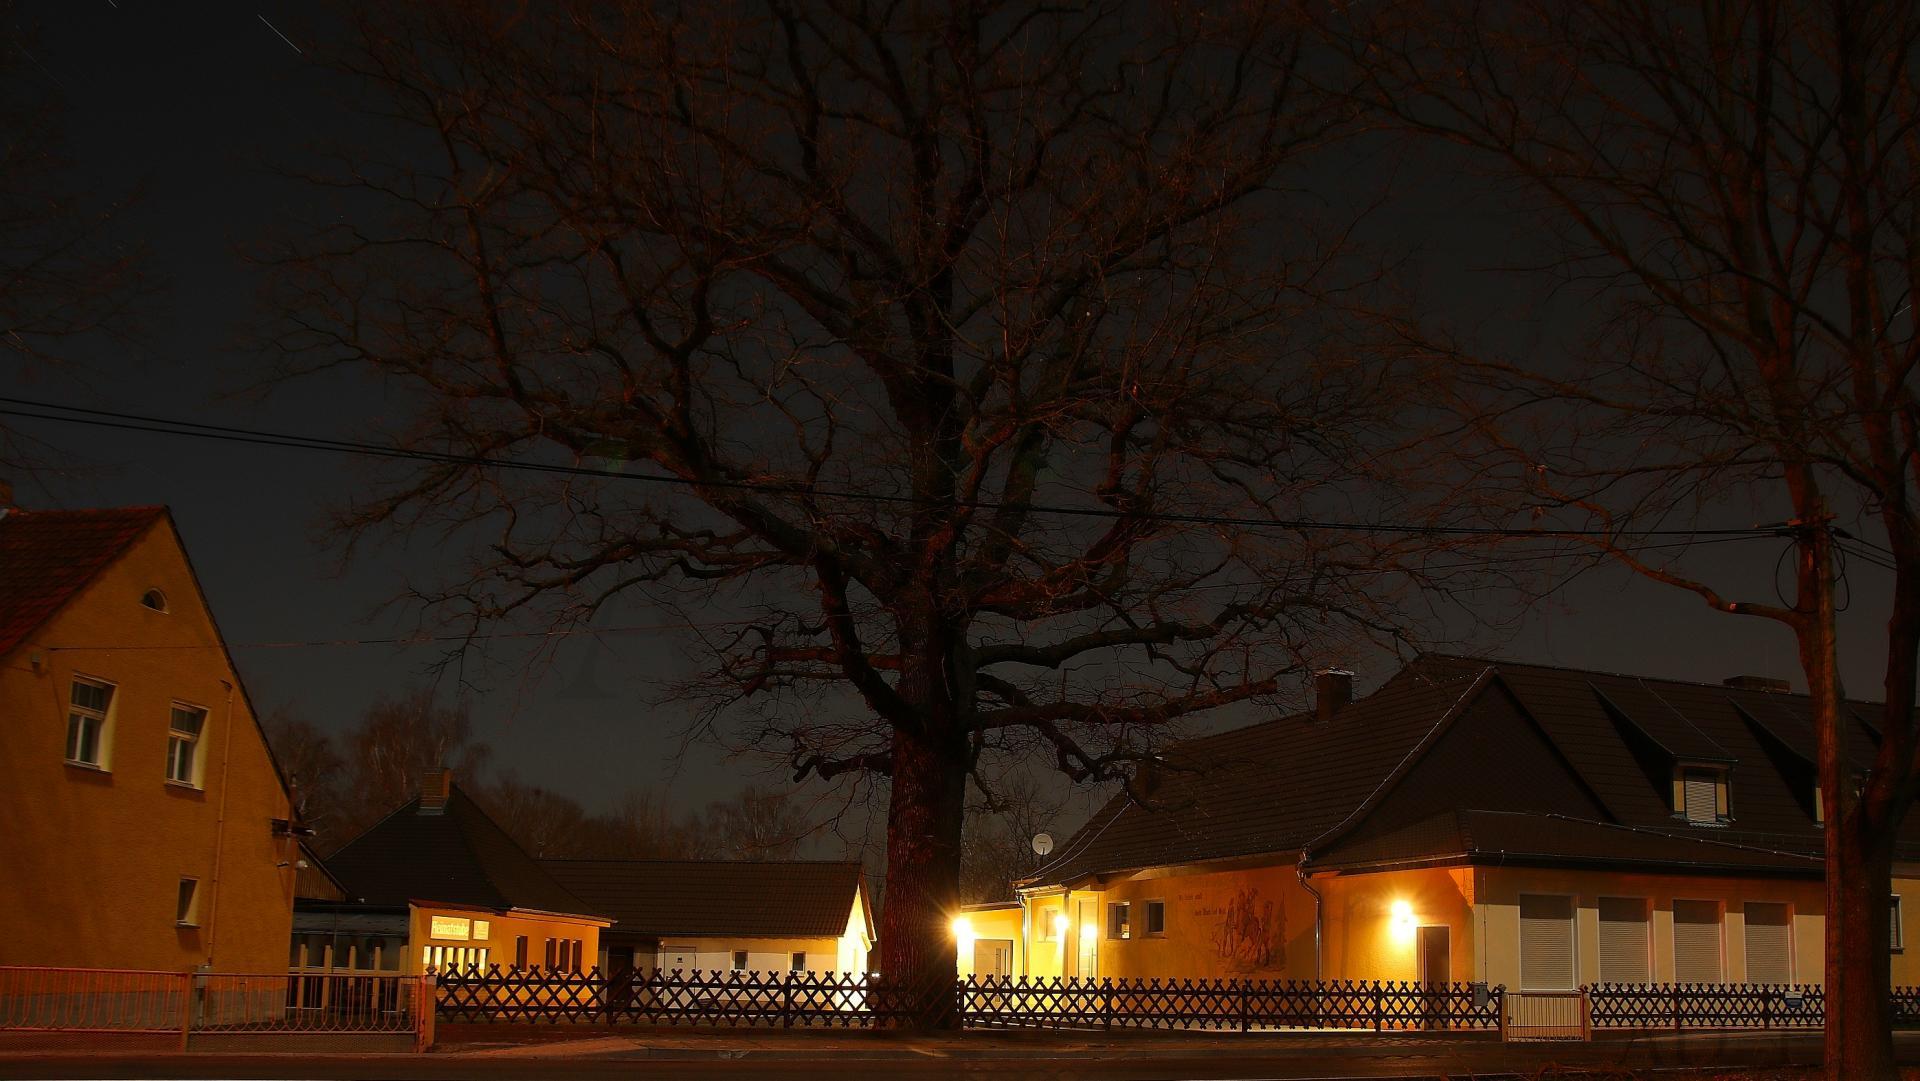 DSV Nachtaufnahme